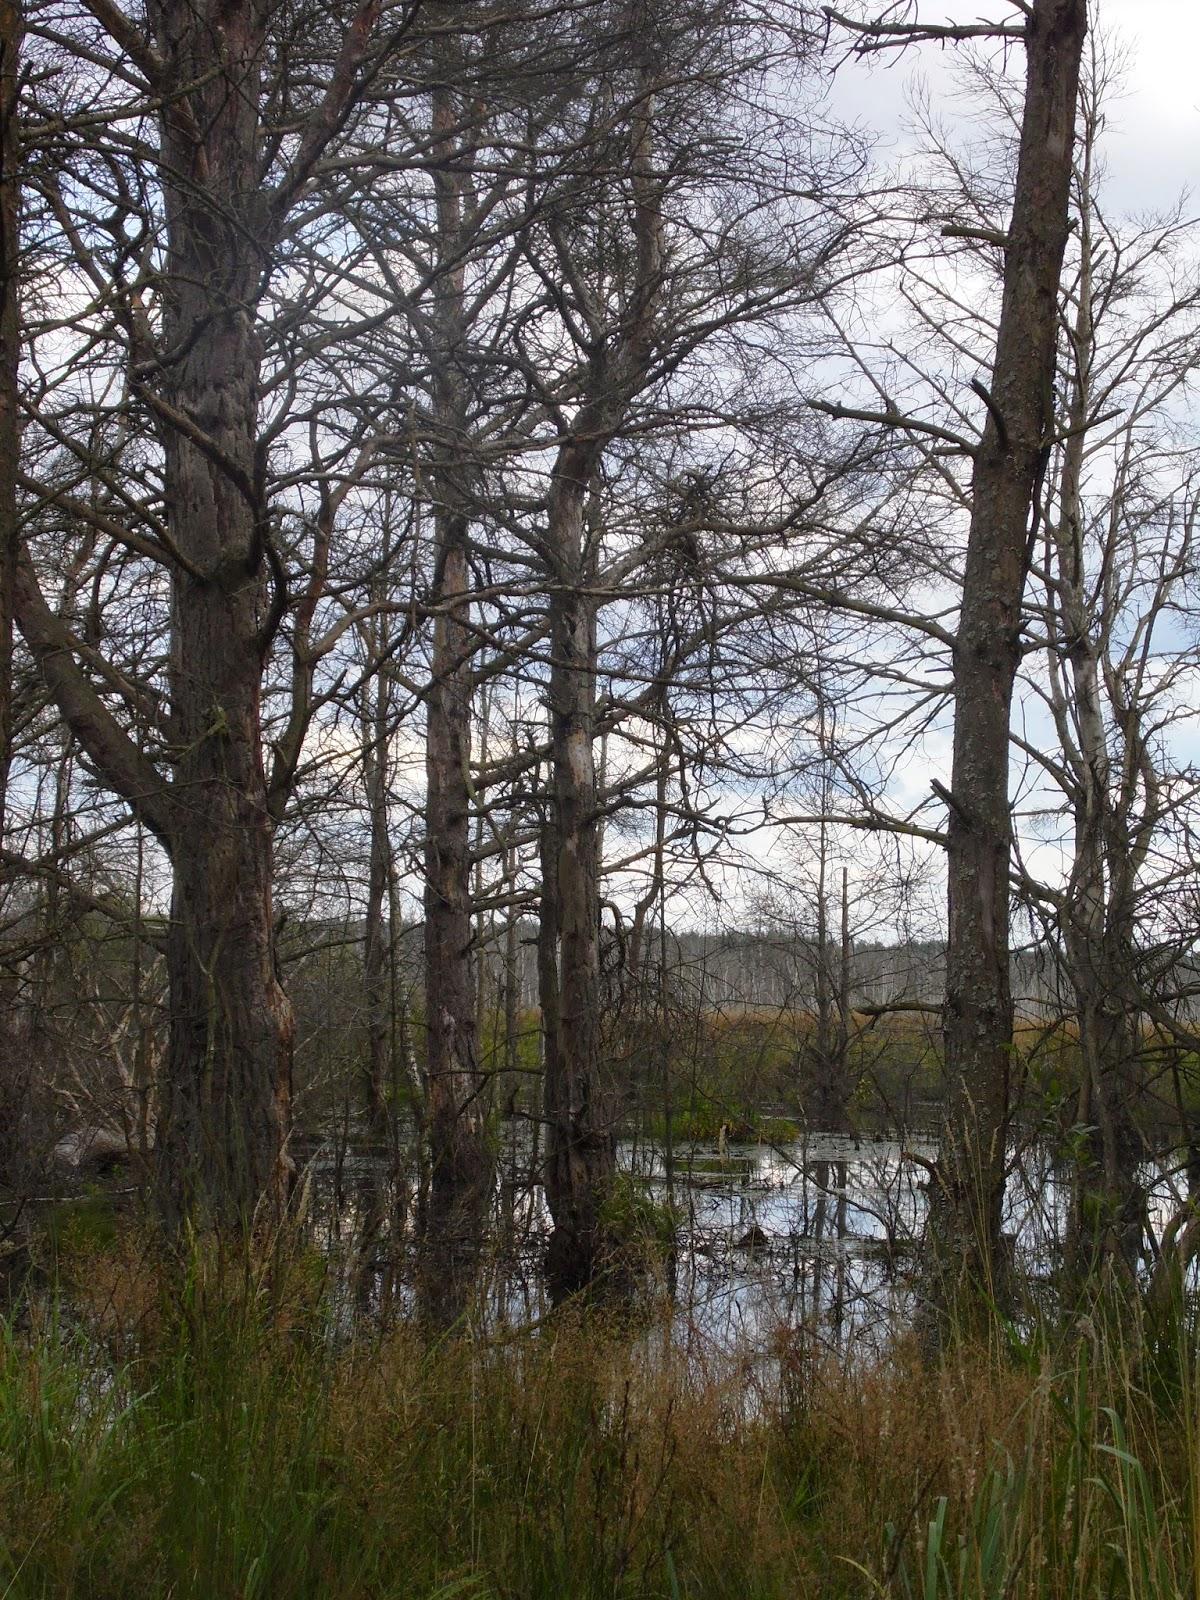 Rezerwat i obszar natura 2000 Bielawskie Błota